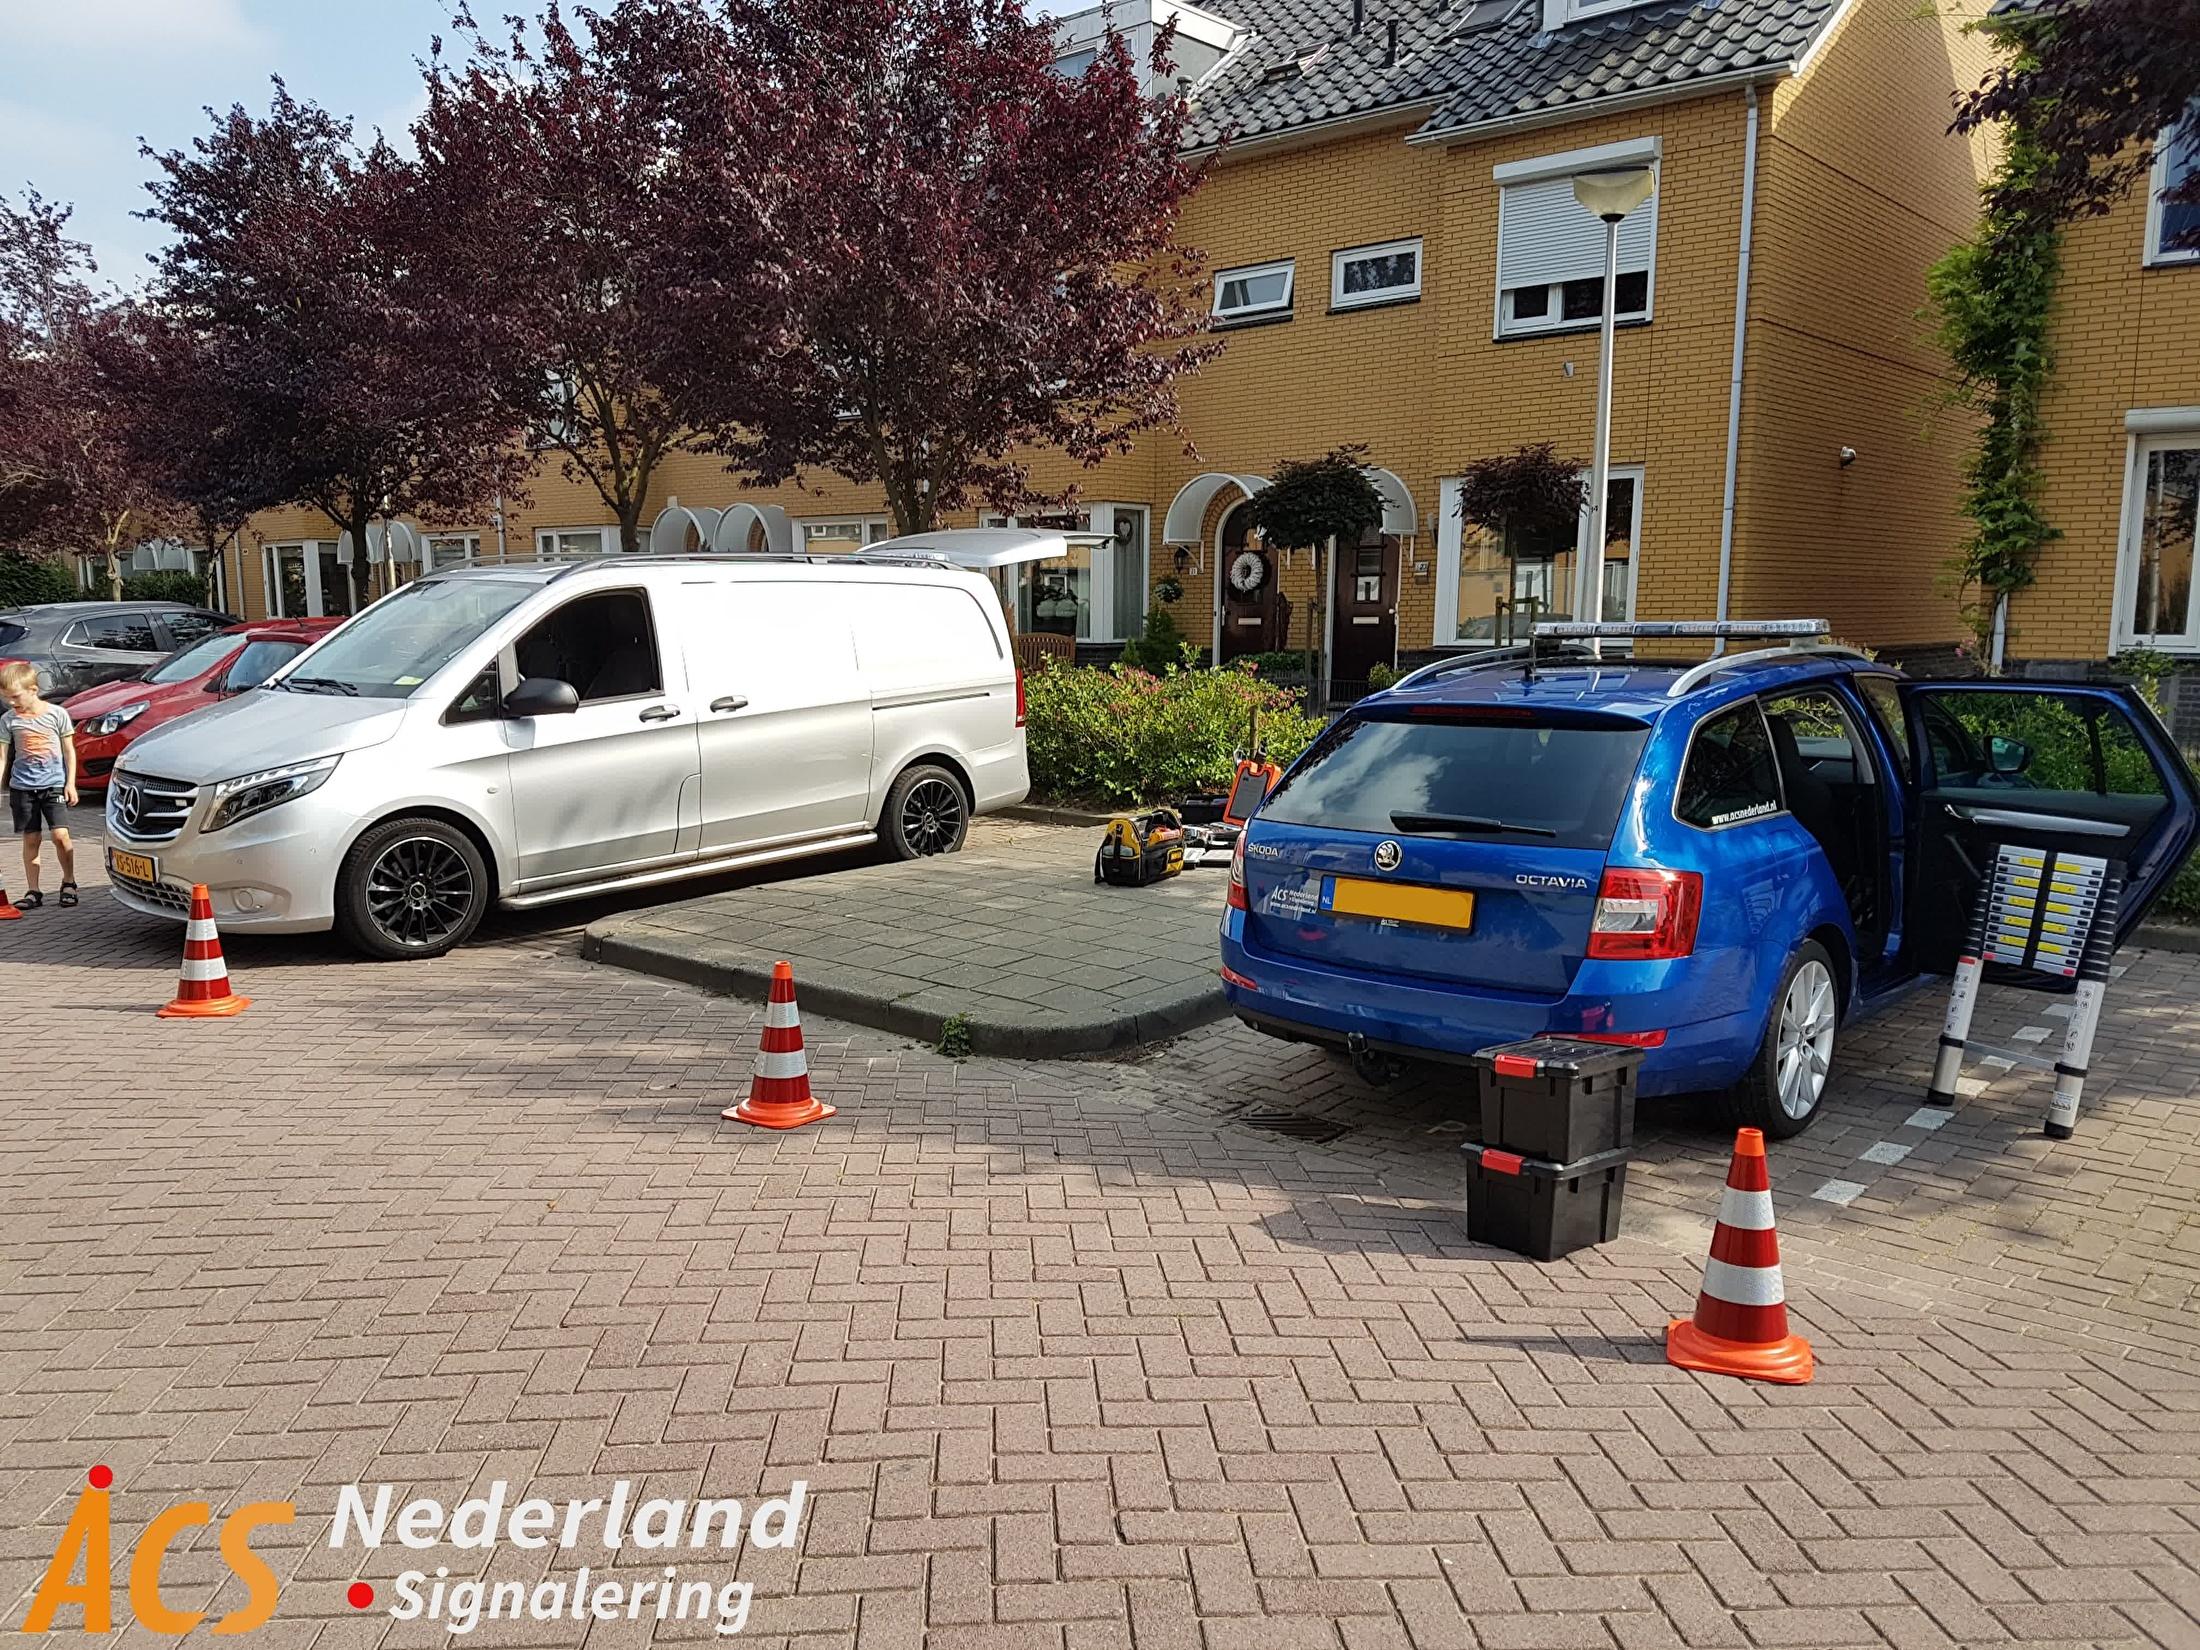 ACS Nederland Locatie Opbouw 1